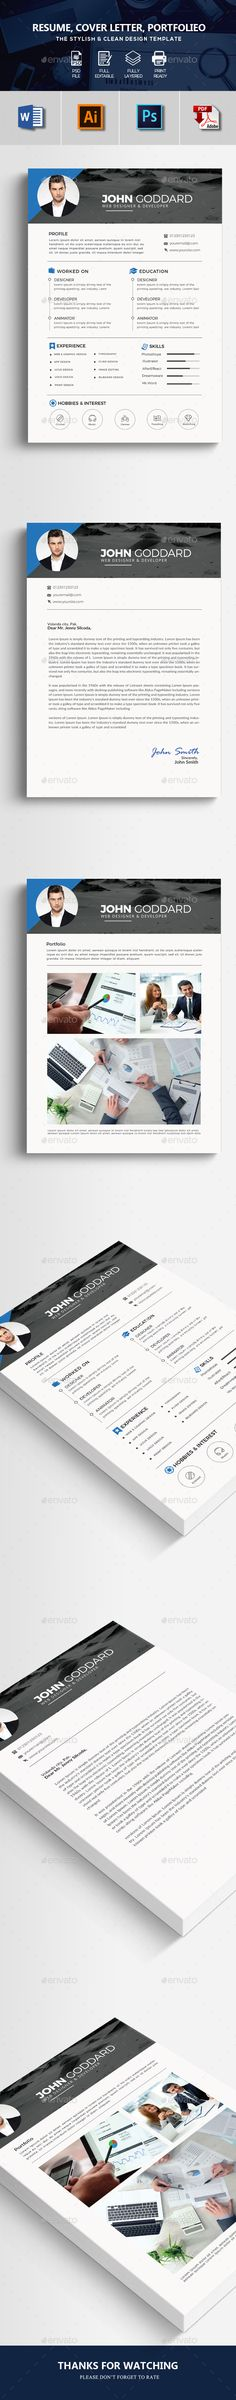 simple creative CV Resume Stationery template design